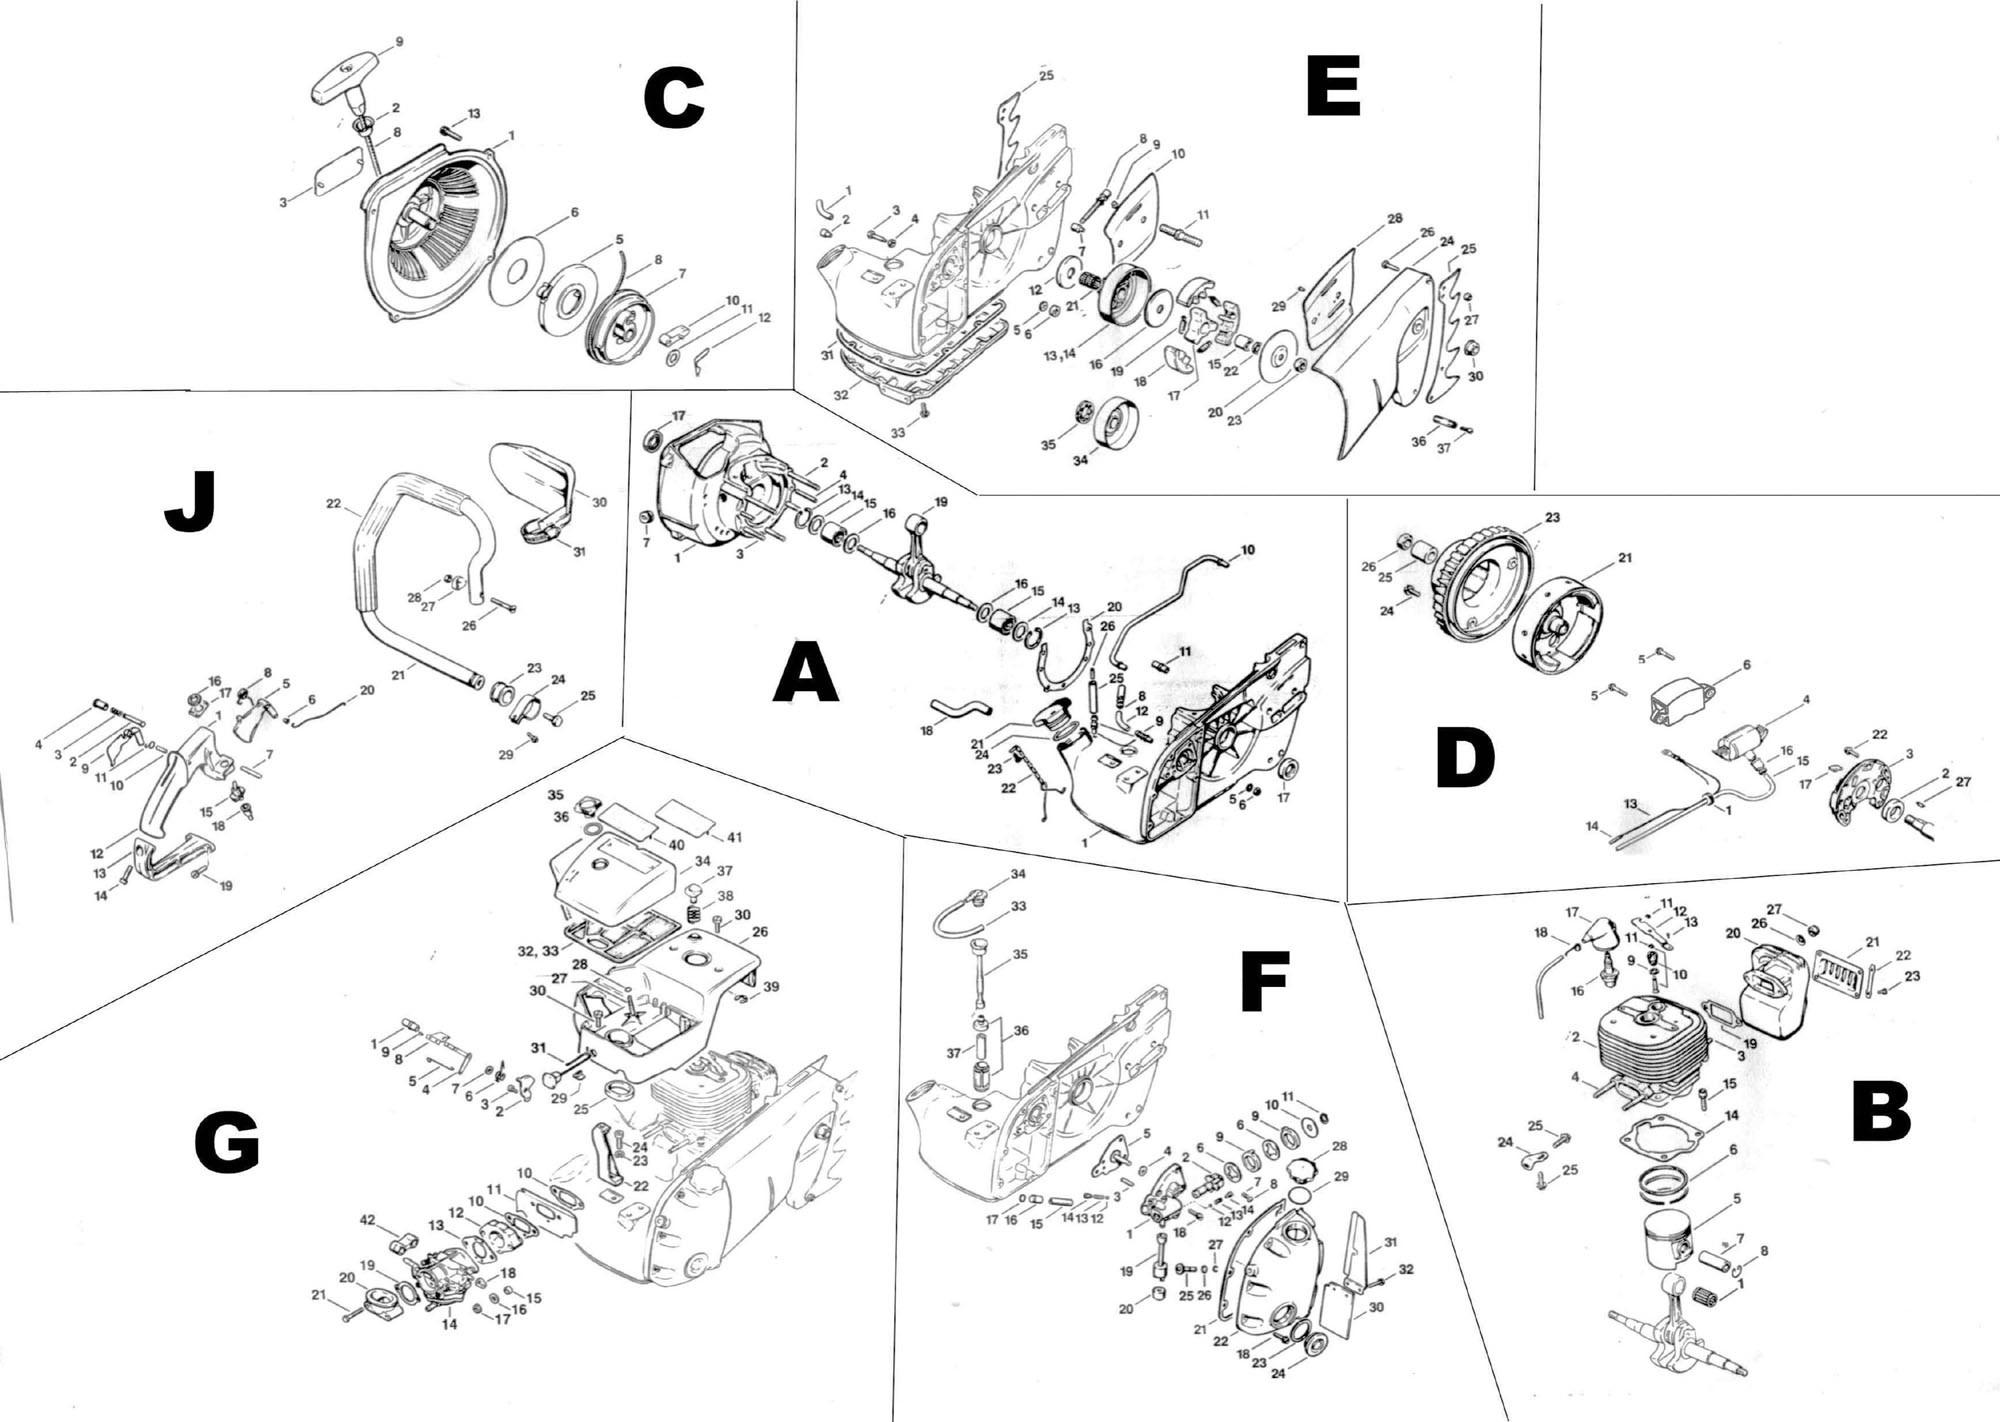 stihl 028 parts diagram stihl chainsaw workshop and